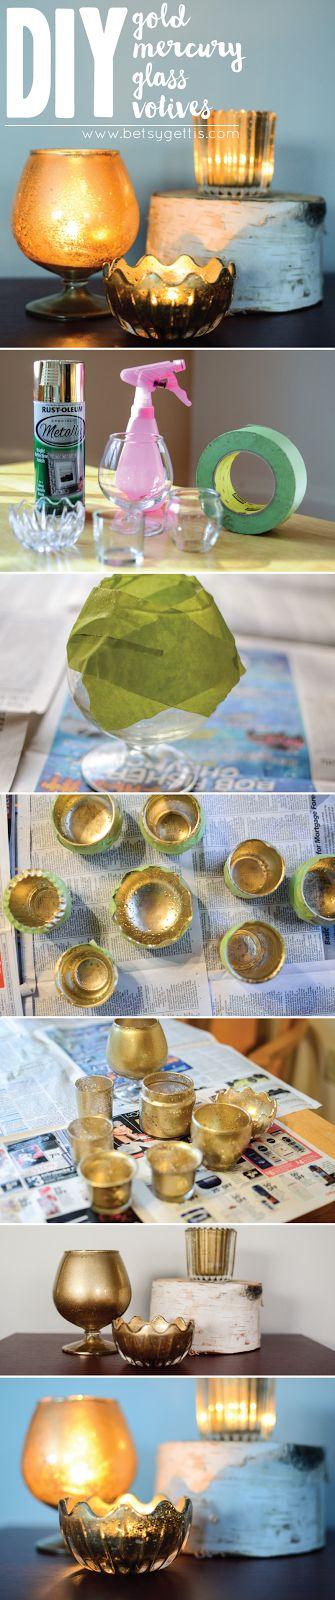 Heavens to Betsy > DIY Gold Mercury Glass